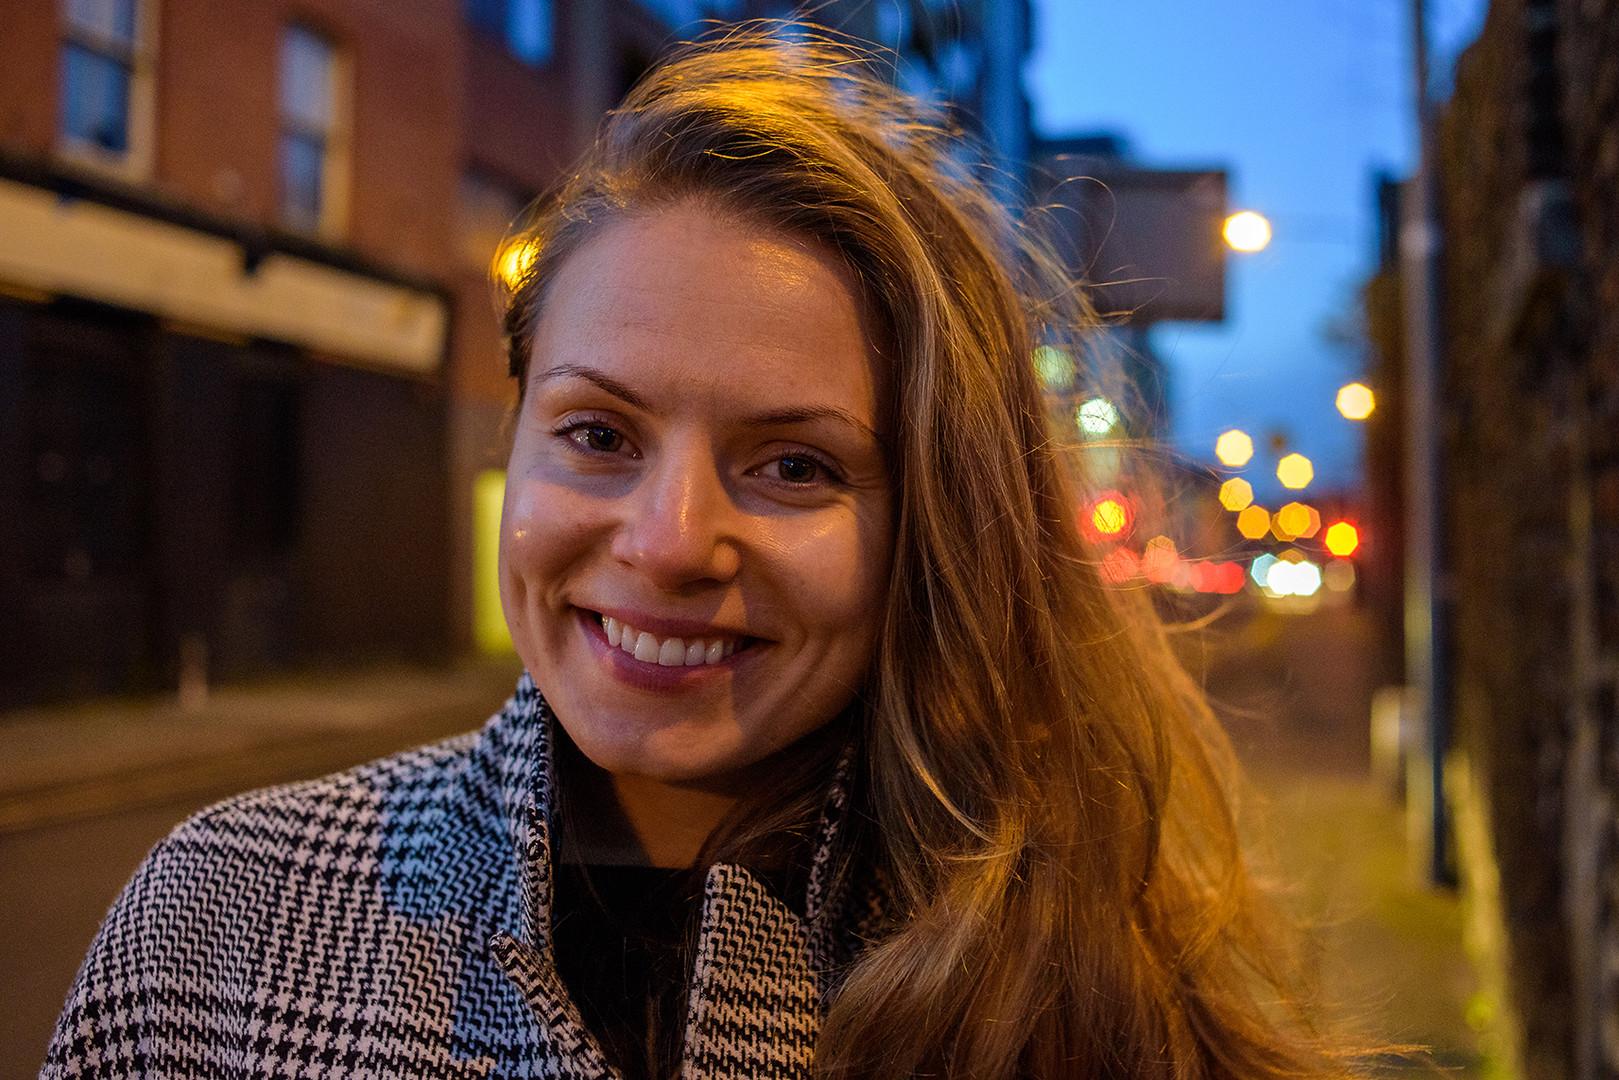 Veronika SardiKo, Dance Teacher at MyArt School of Dance & Art